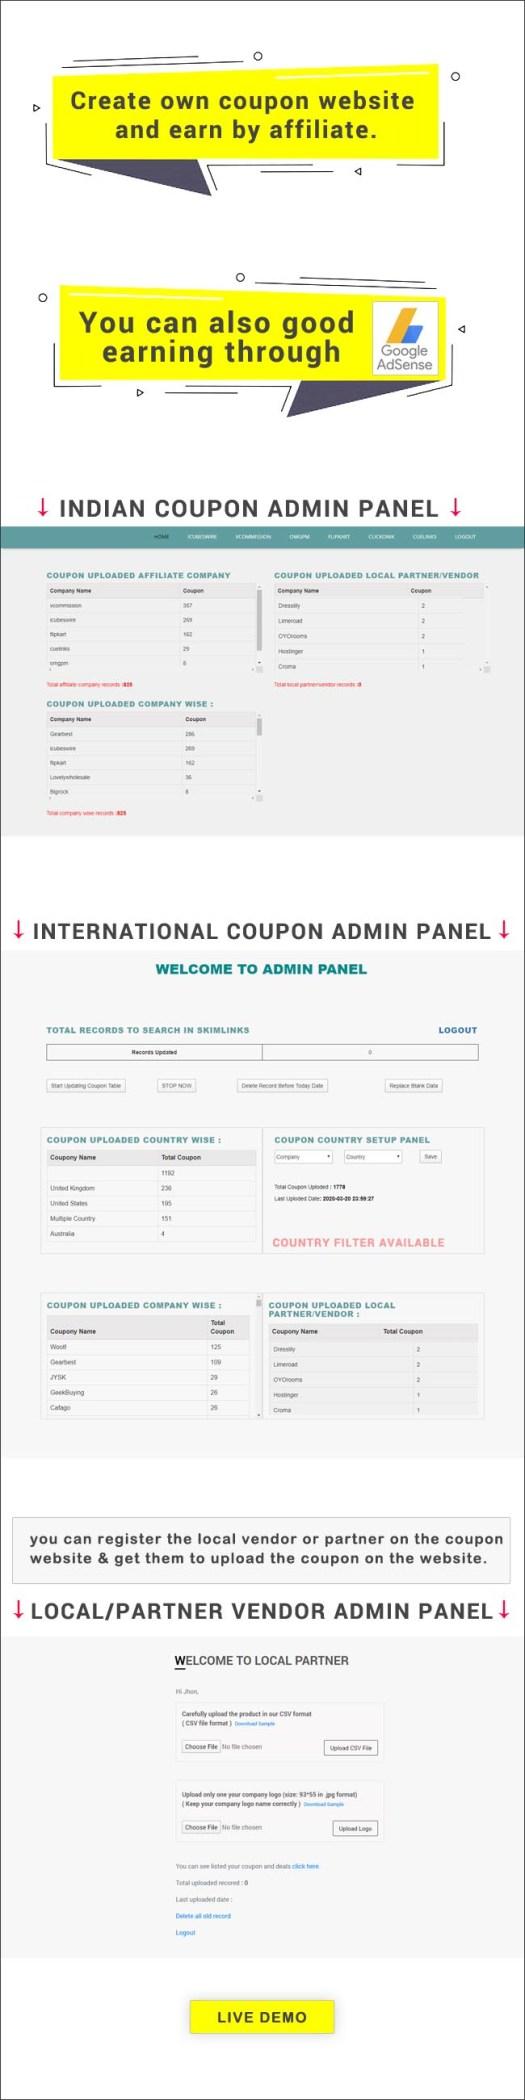 iCOUPON - Coupon API Listing Website - 1